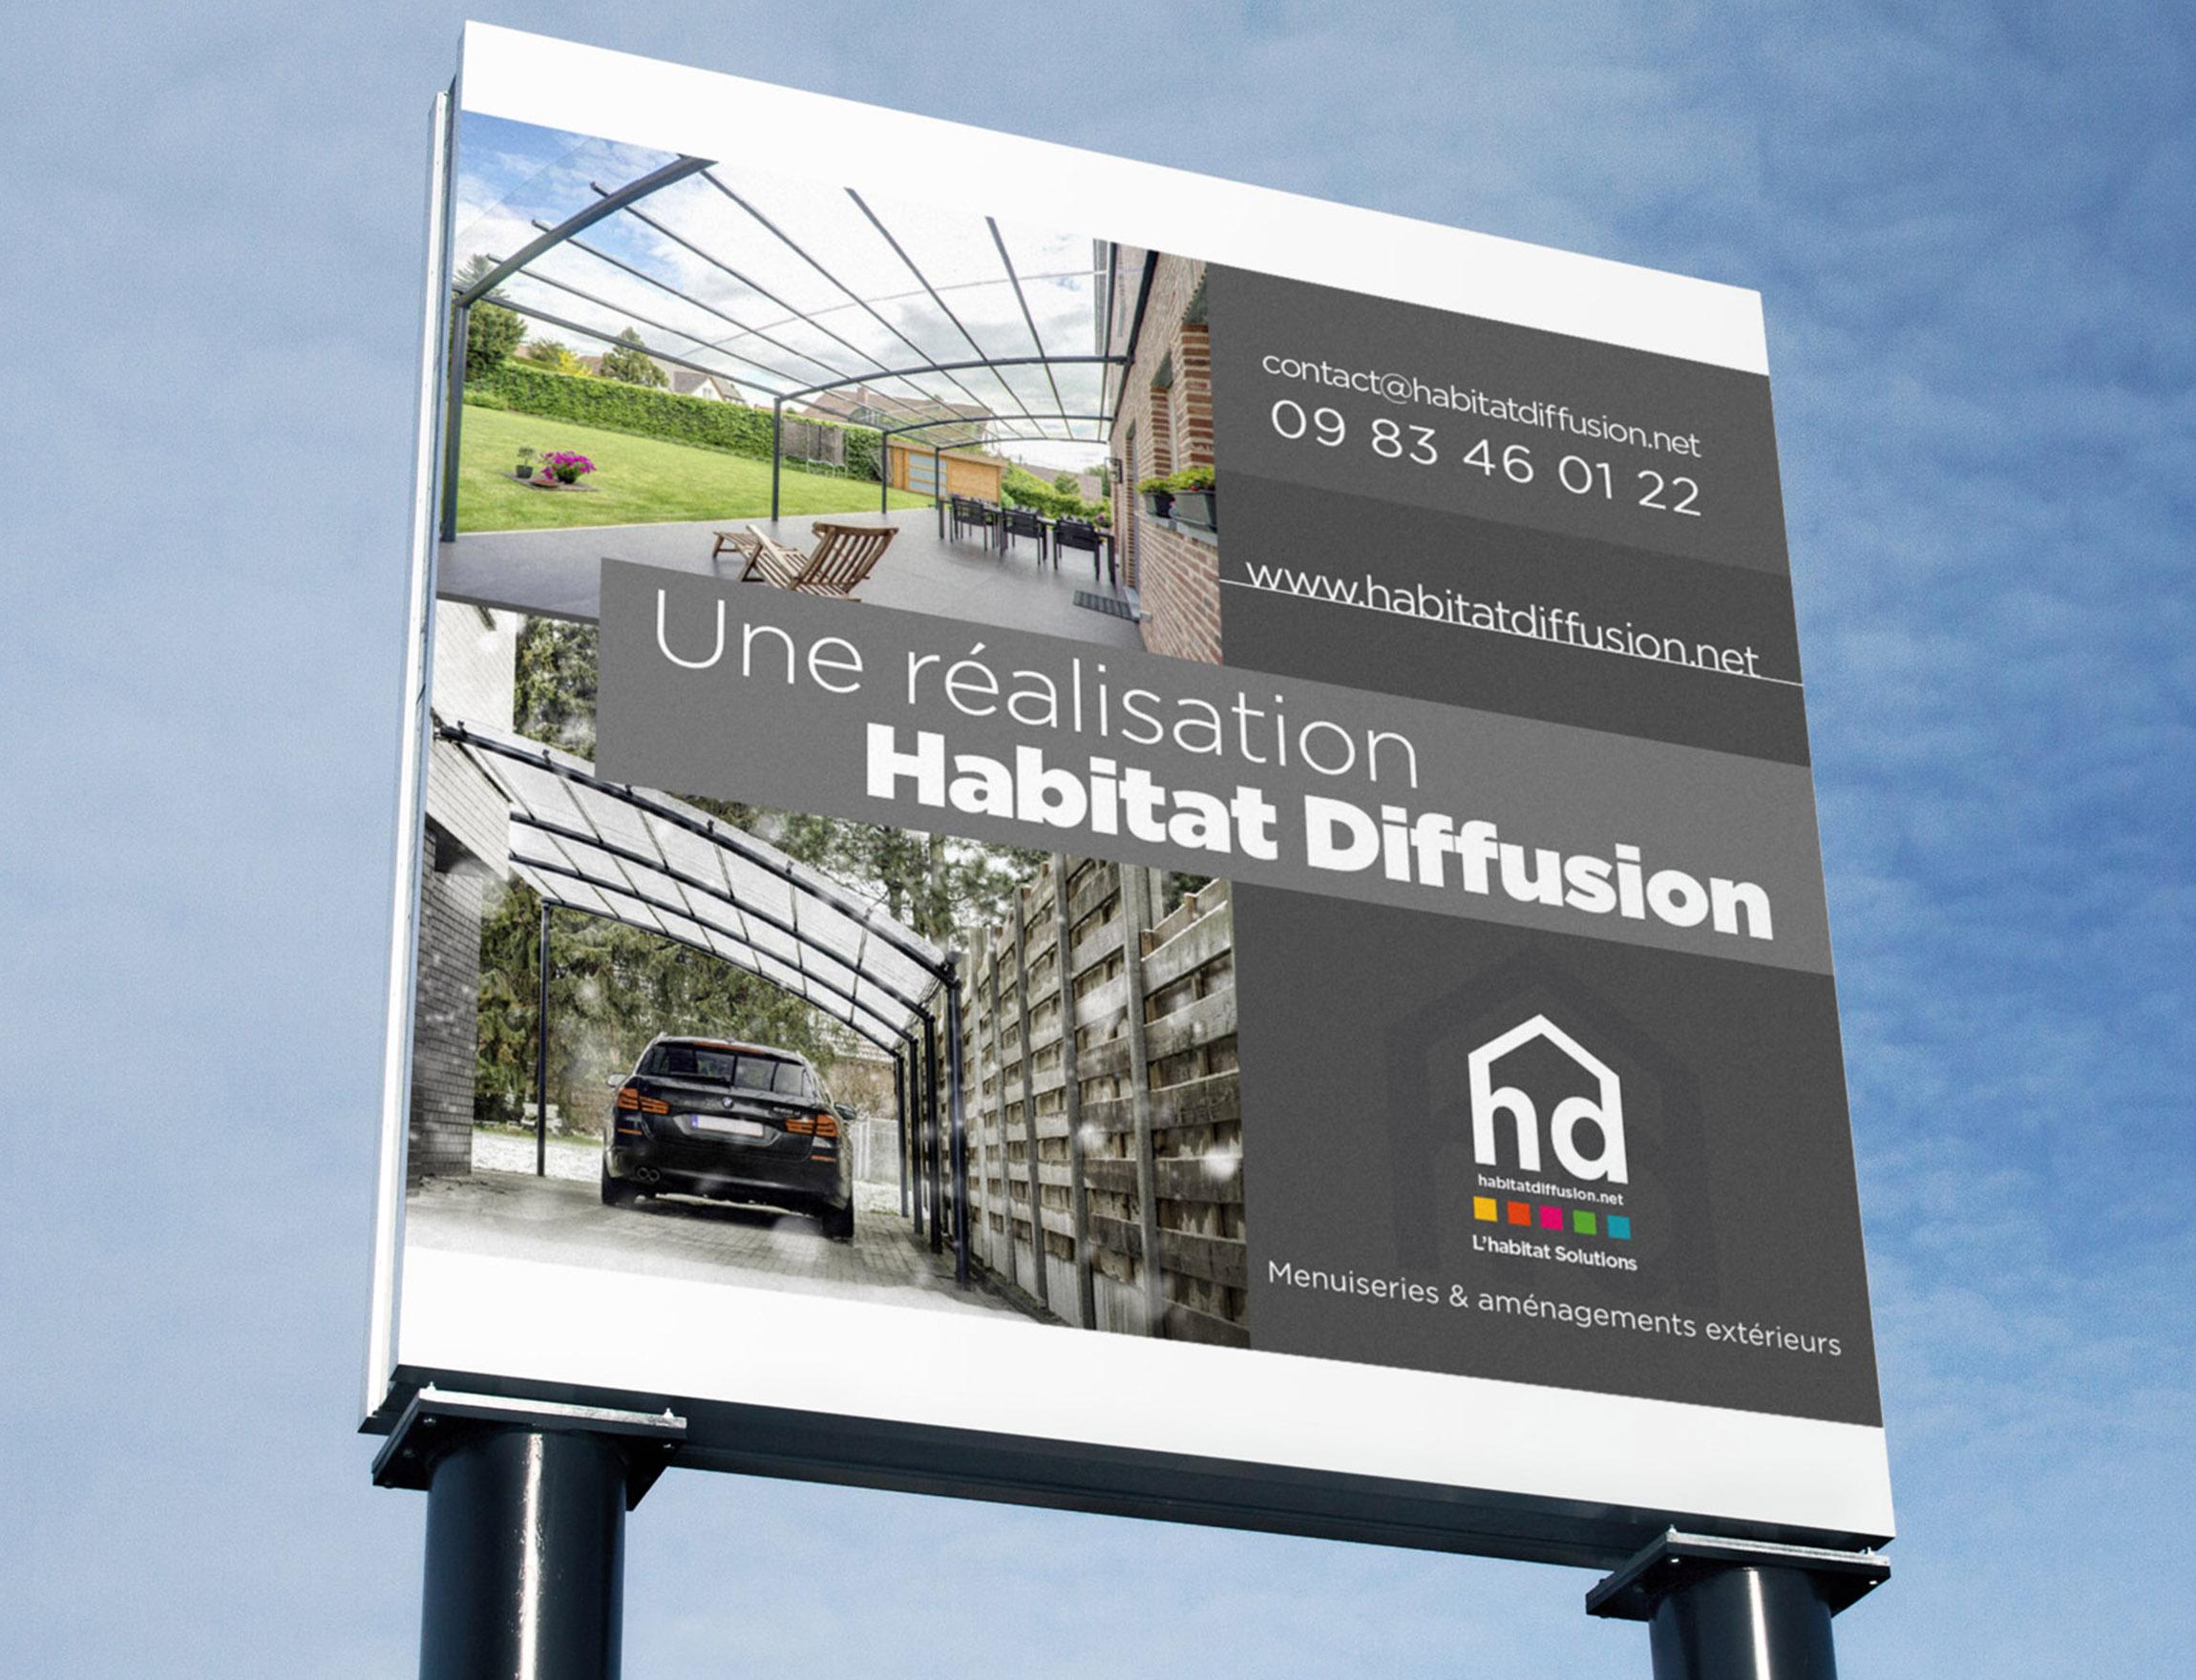 Habitat Diffusion